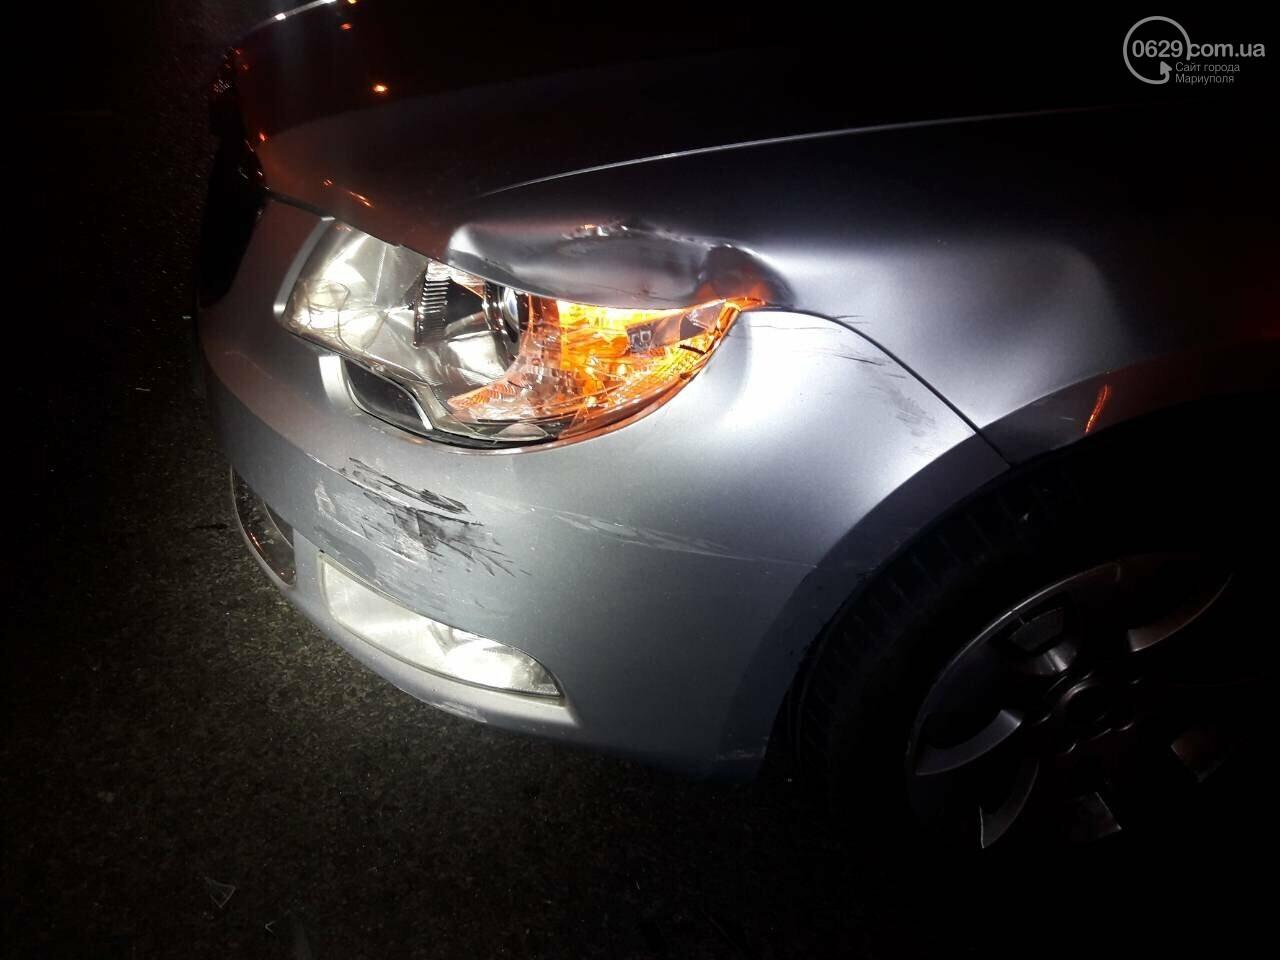 В центре Мариуполя столкнулись два автомобиля, — ФОТО, фото-9